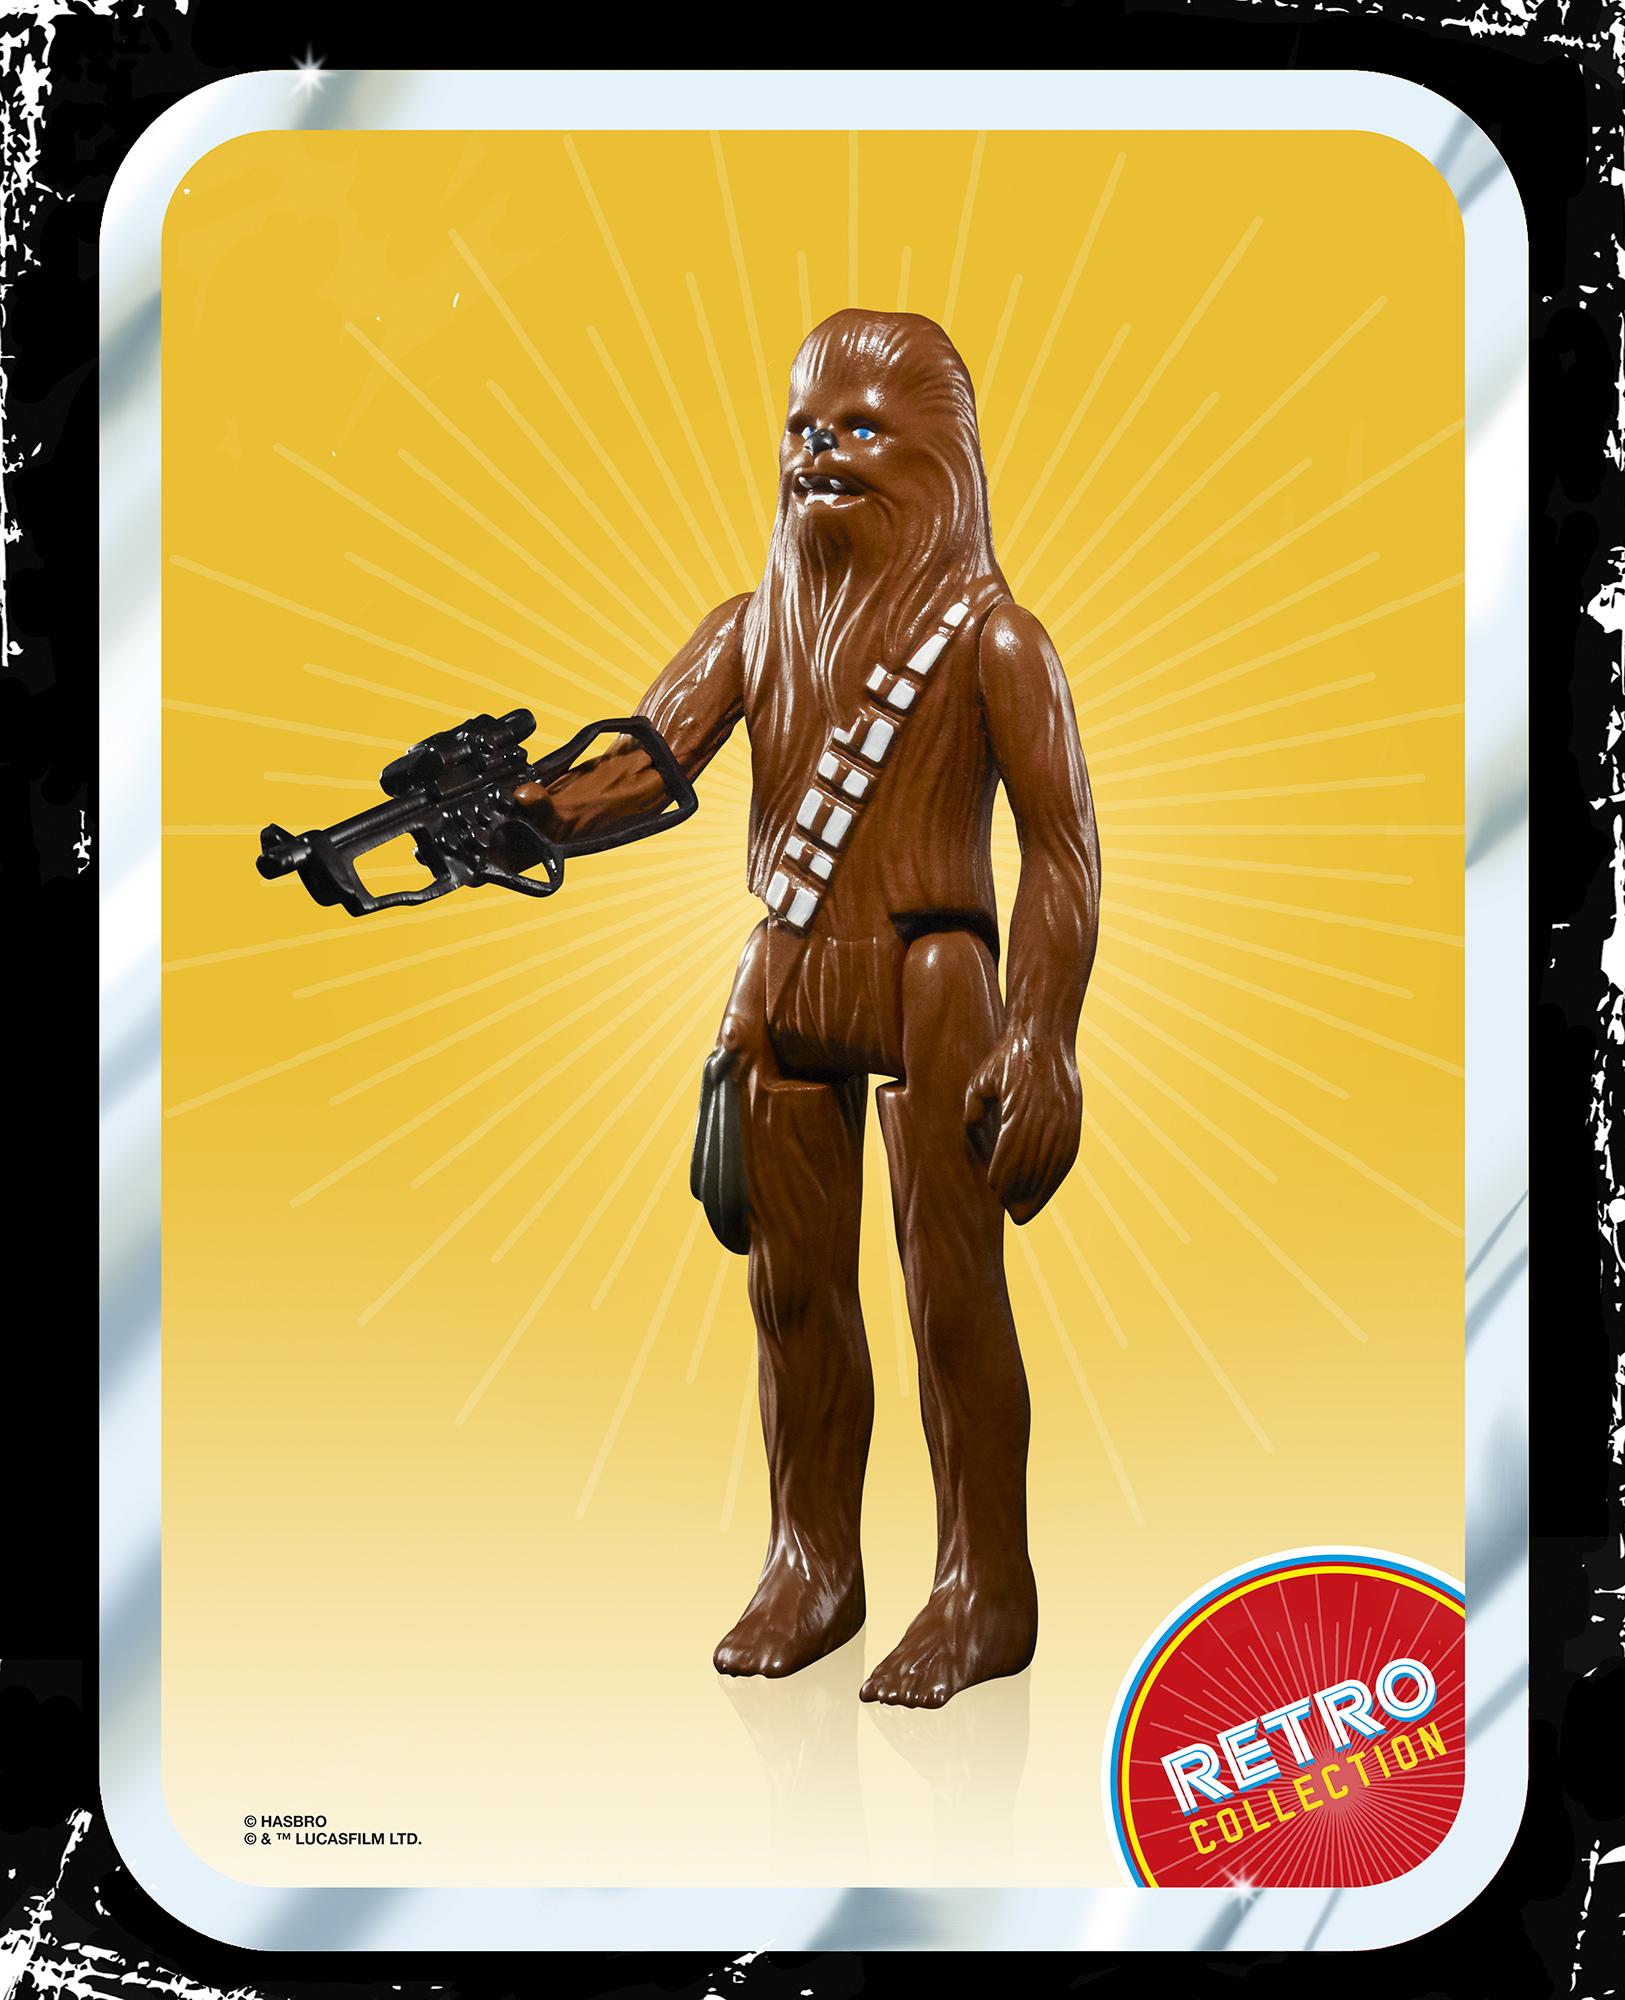 Star-Wars-Retro-Chewbacca-oop